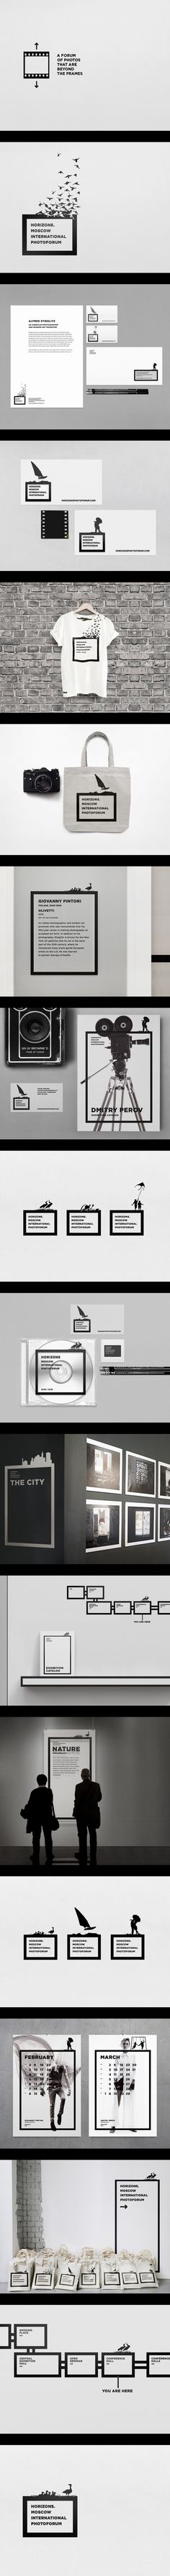 corporate design, mydesi 淘靈感, graphic design, logo, visual identity, identity branding, corporate identity, vova lifanov, black box